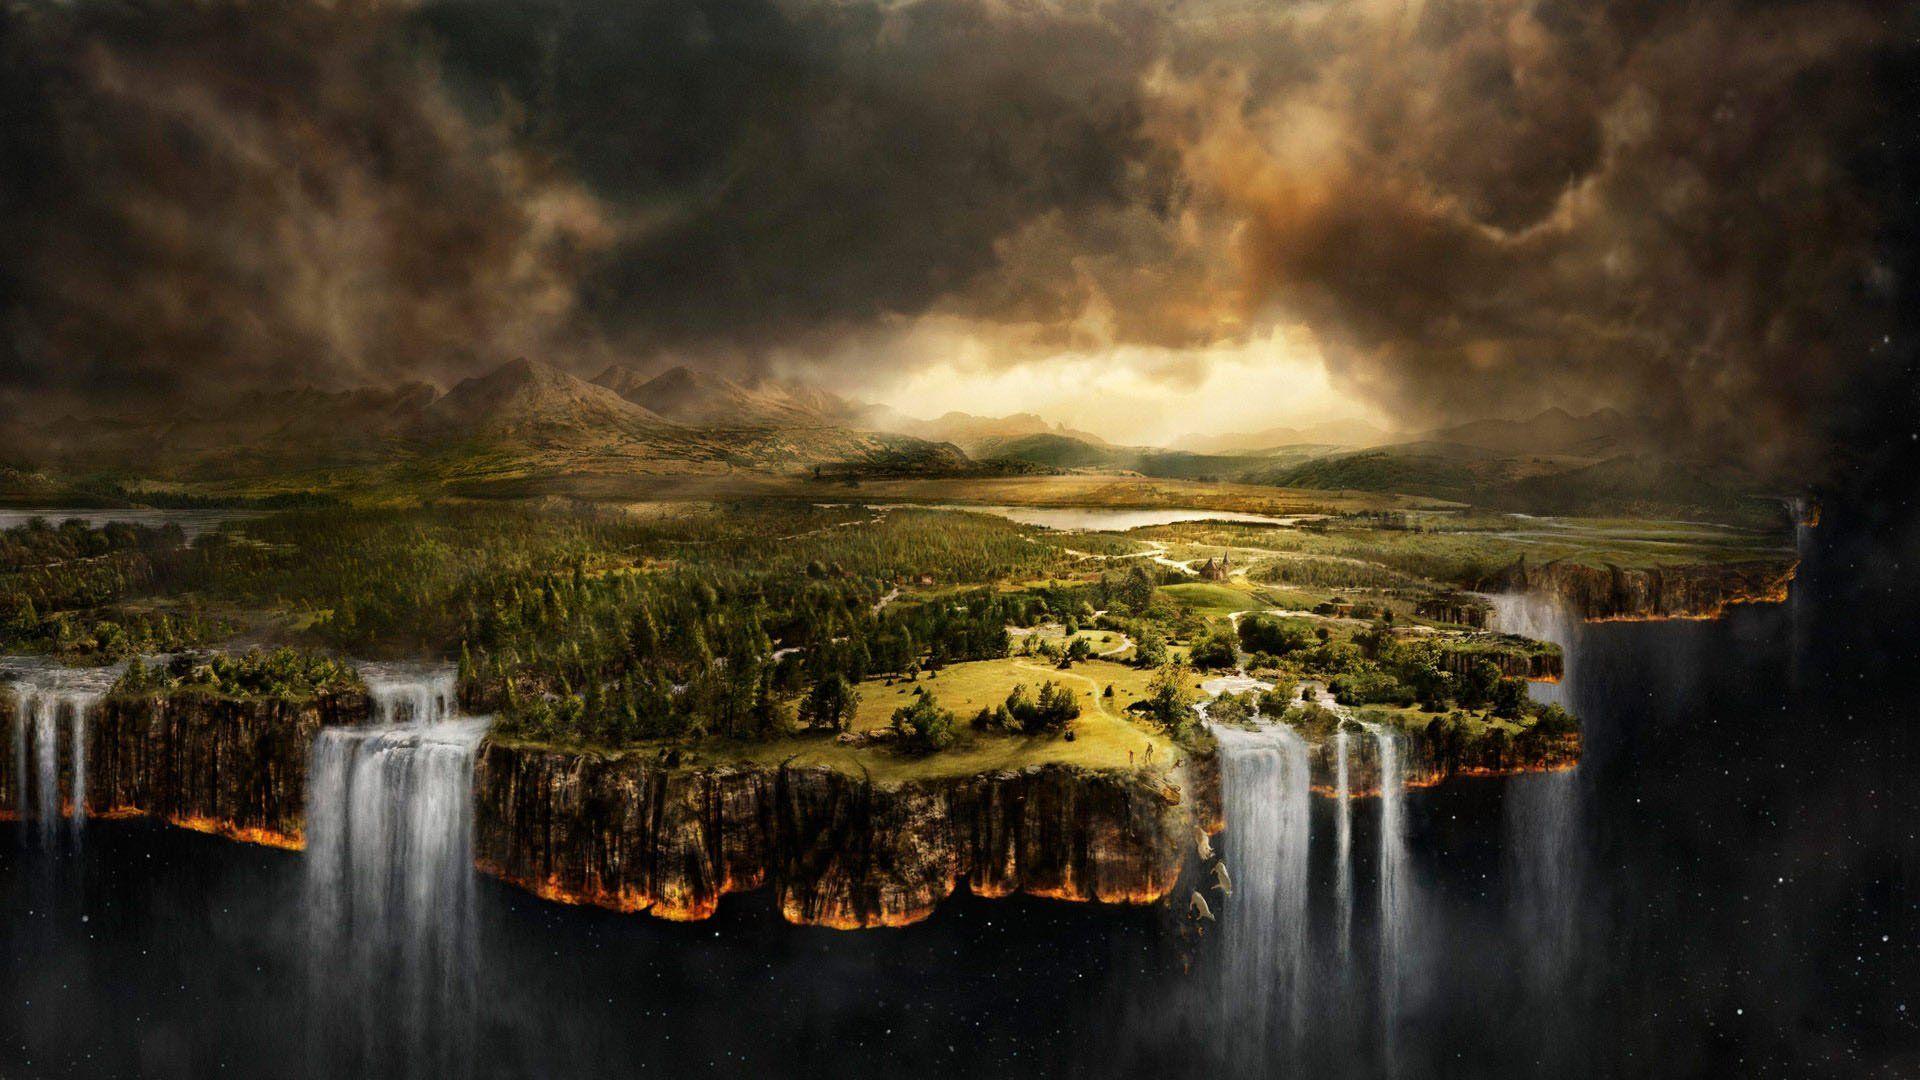 Fantasy Mystical Magic Fantasy Landscape Scenery Wallpaper World Wallpaper